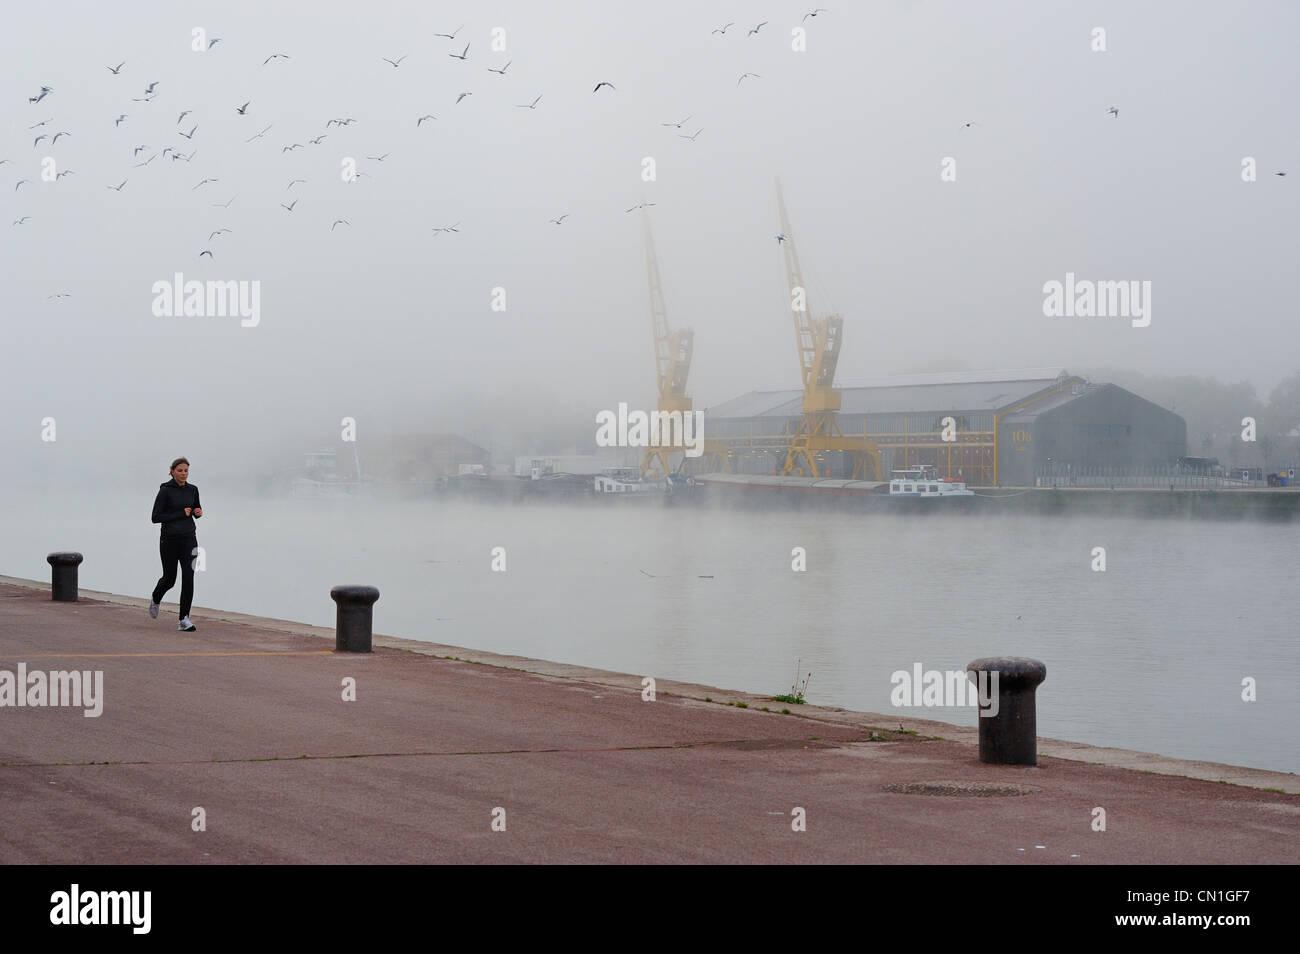 France, Seine Maritime, Rouen, the former docks on the Seine banks, the cranes under mist - Stock Image